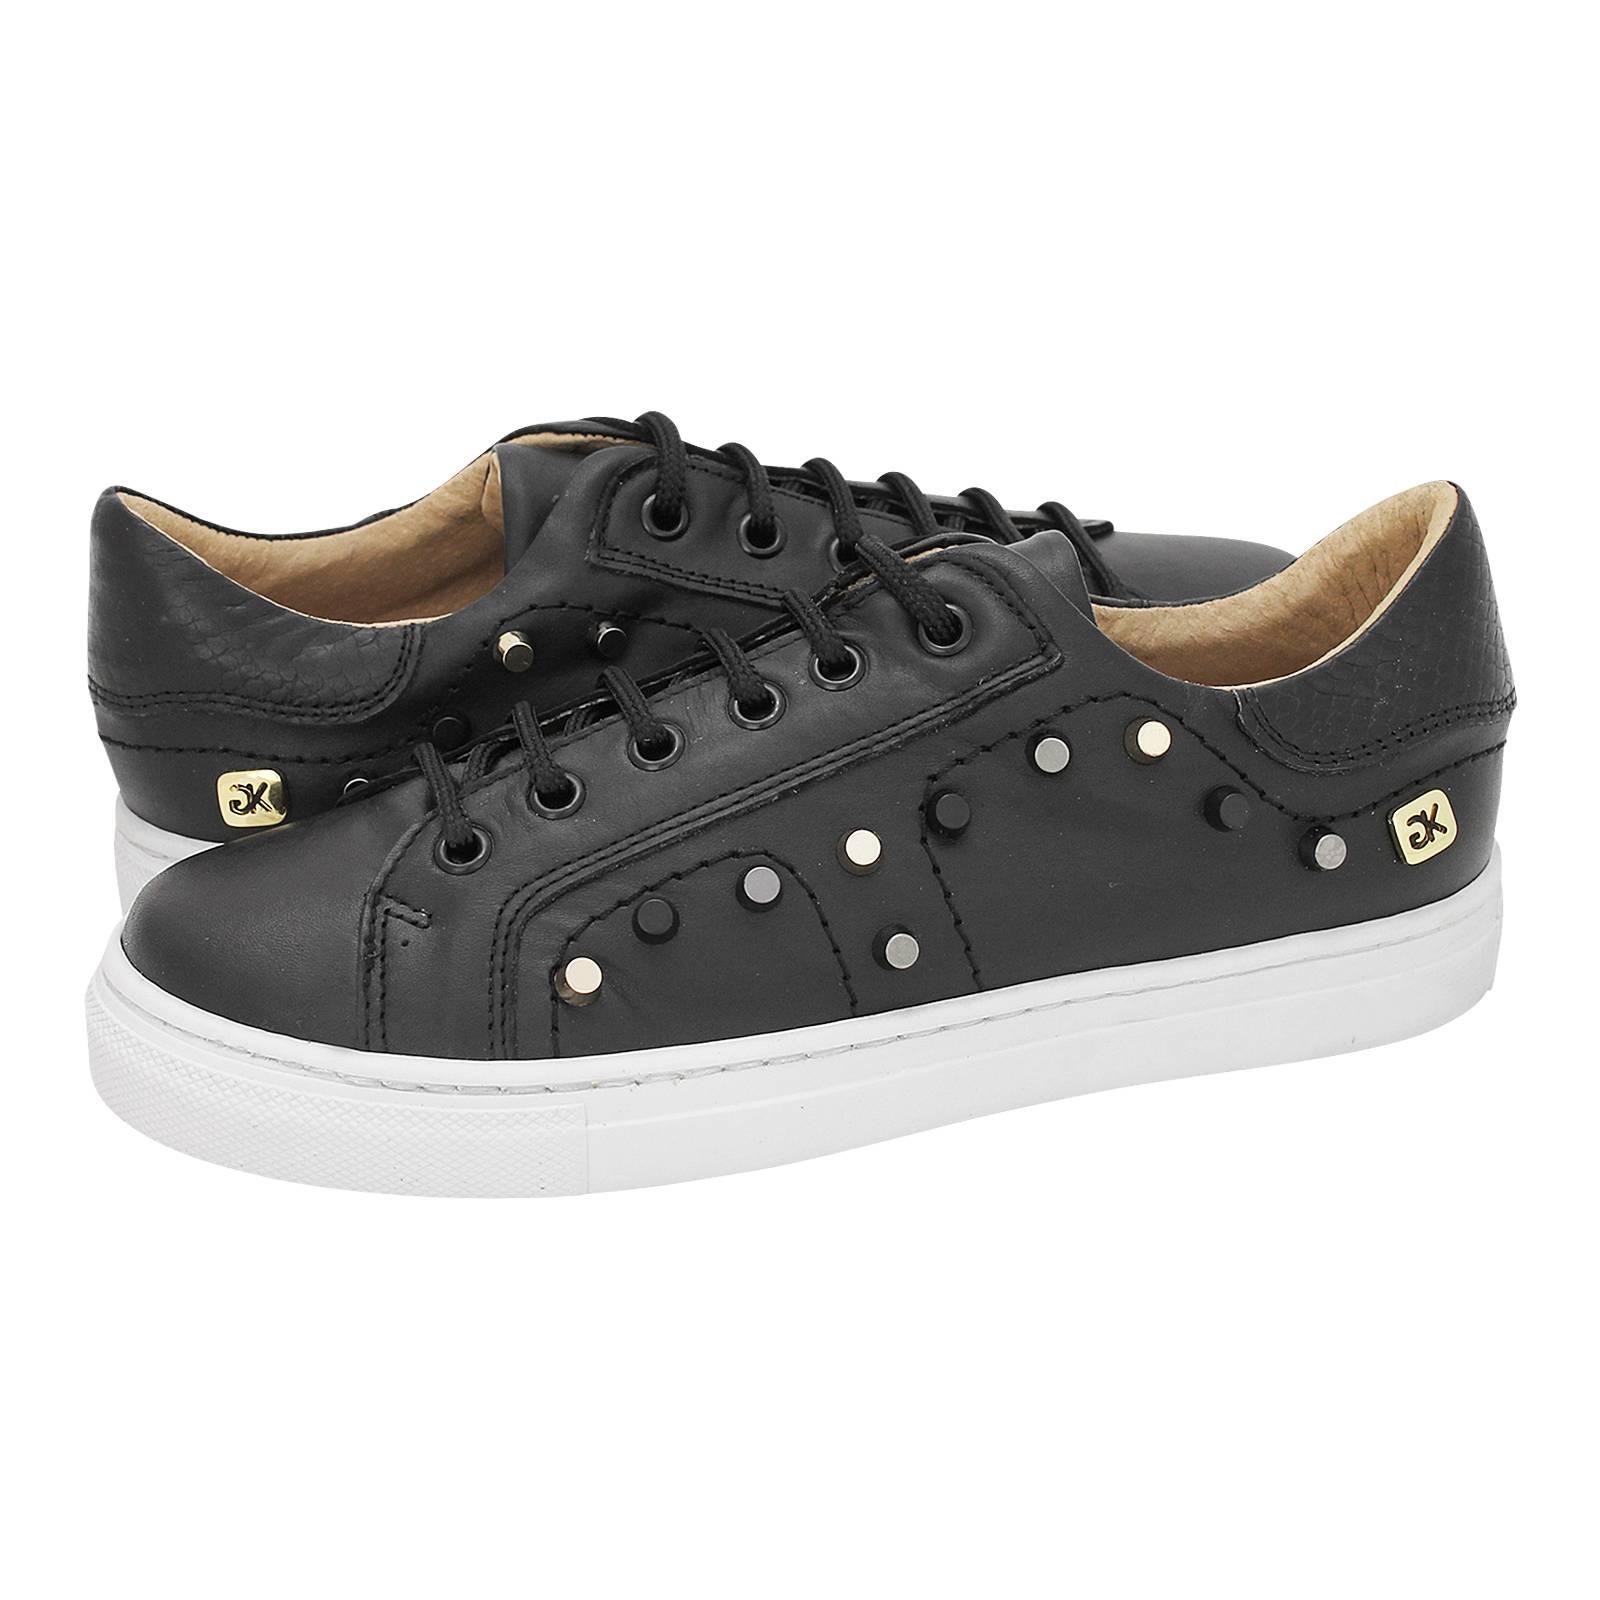 Campestre - Γυναικεία παπούτσια casual Gianna Kazakou από δέρμα ... 2d171f19da5